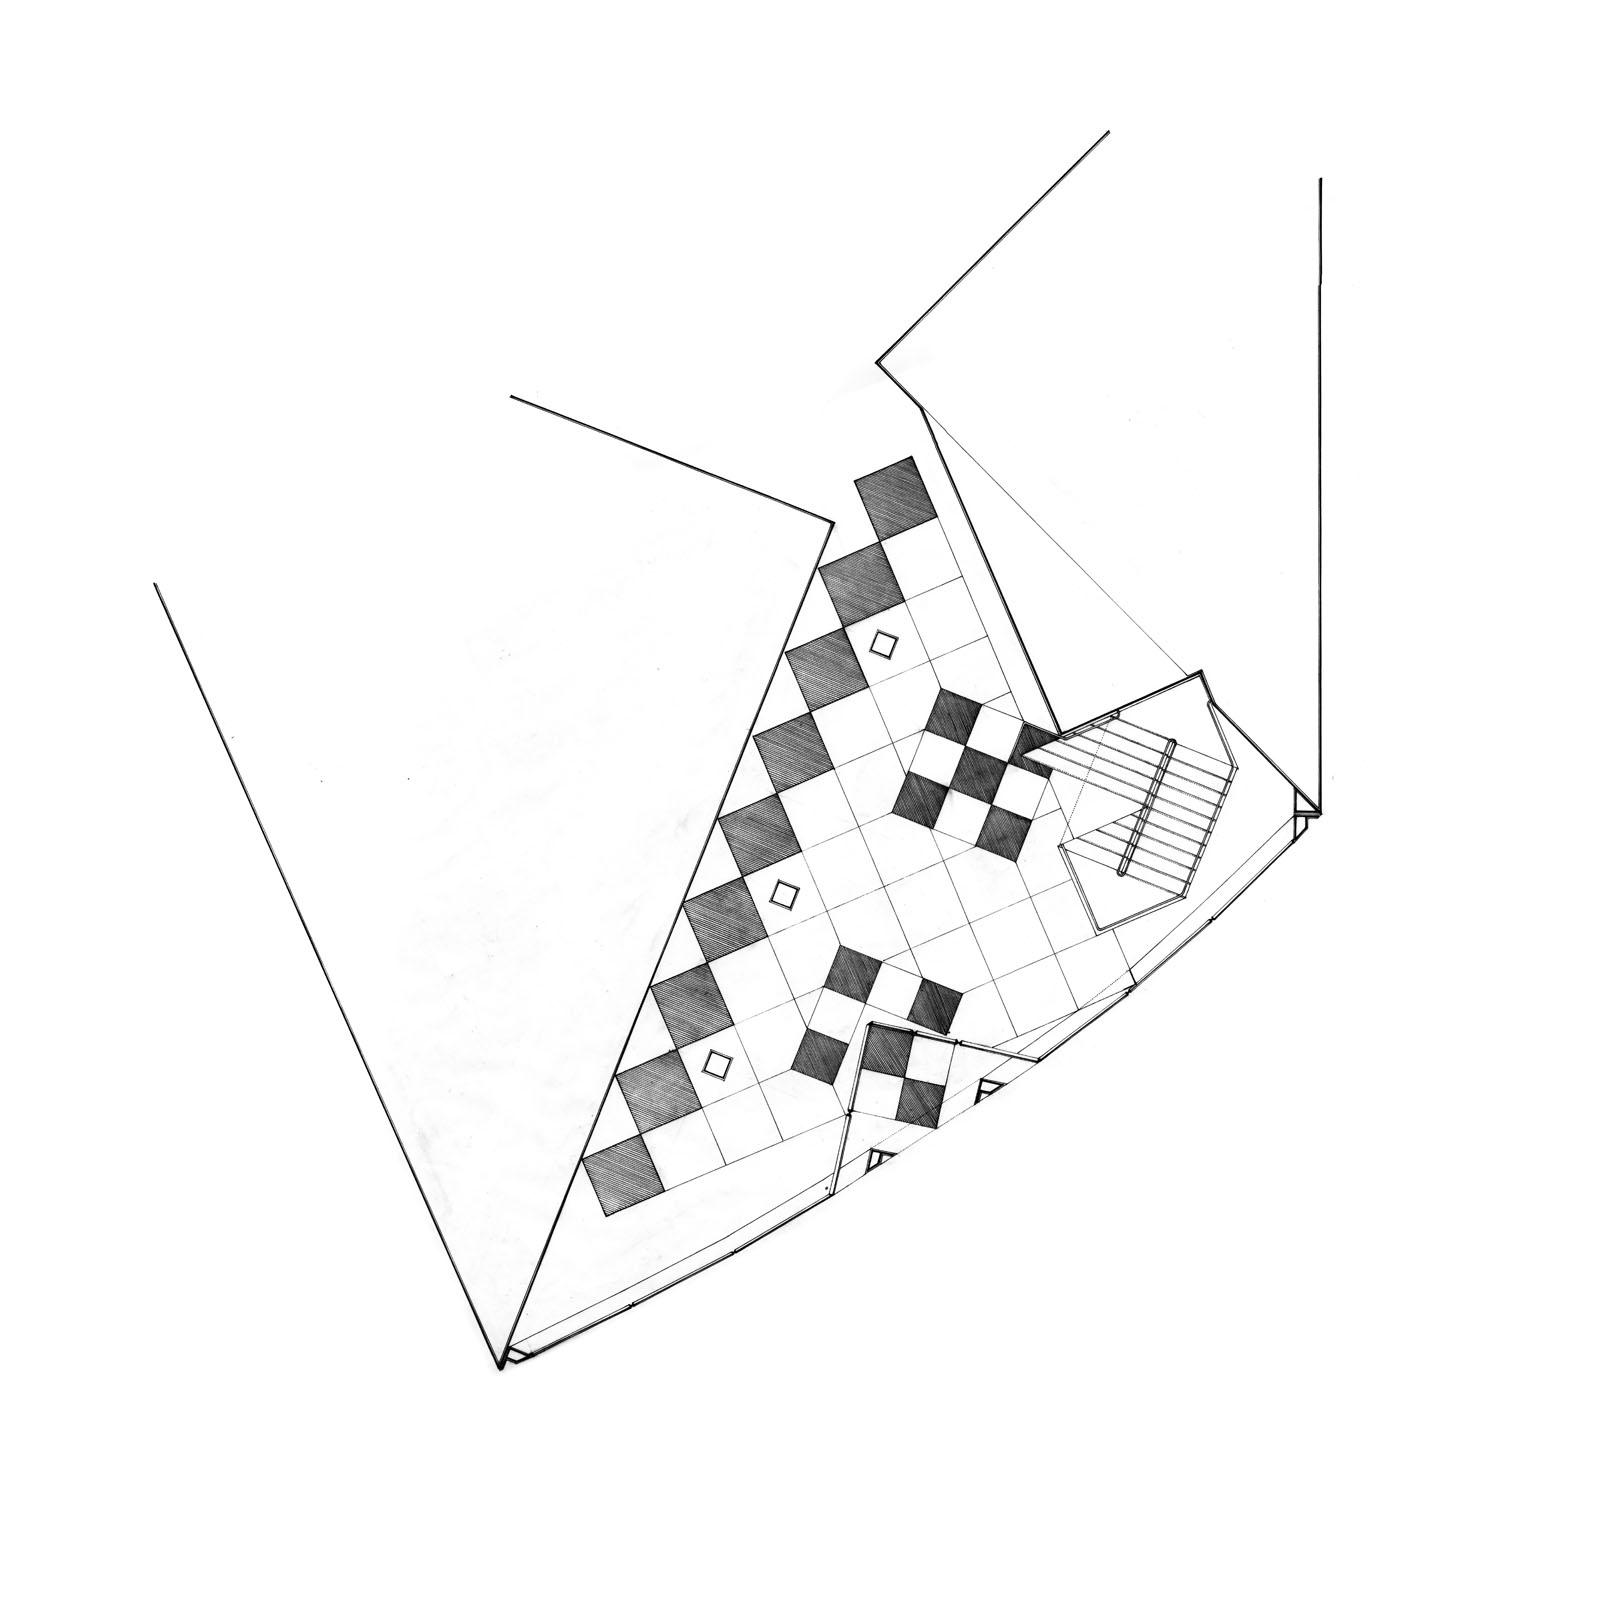 danielvillalobos-architecturexxthcentury-spanisharchitecture-schoolarchitectureproject-9